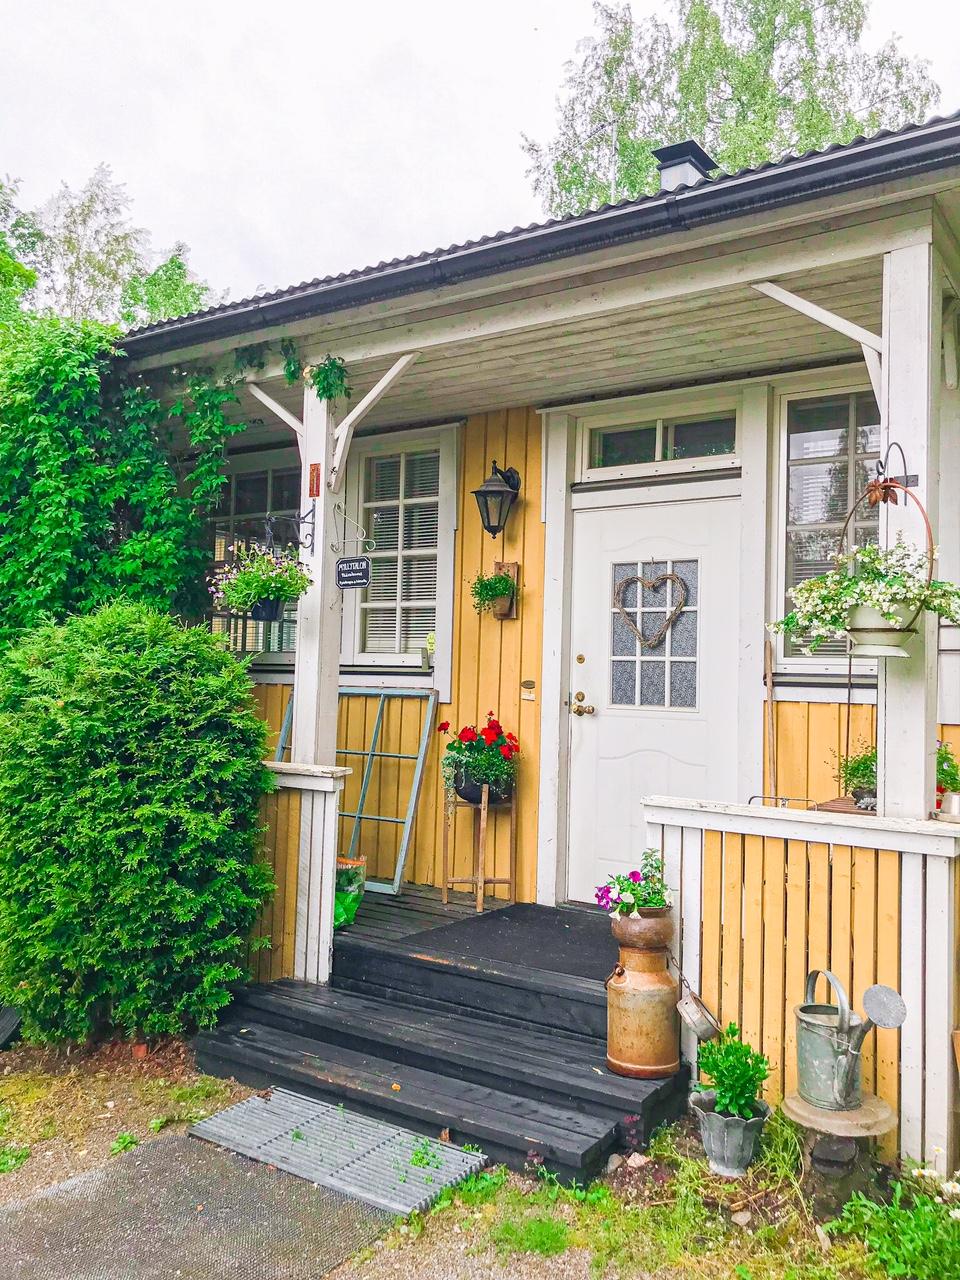 Elluyellow vierailemassa Hämeenlinnassa